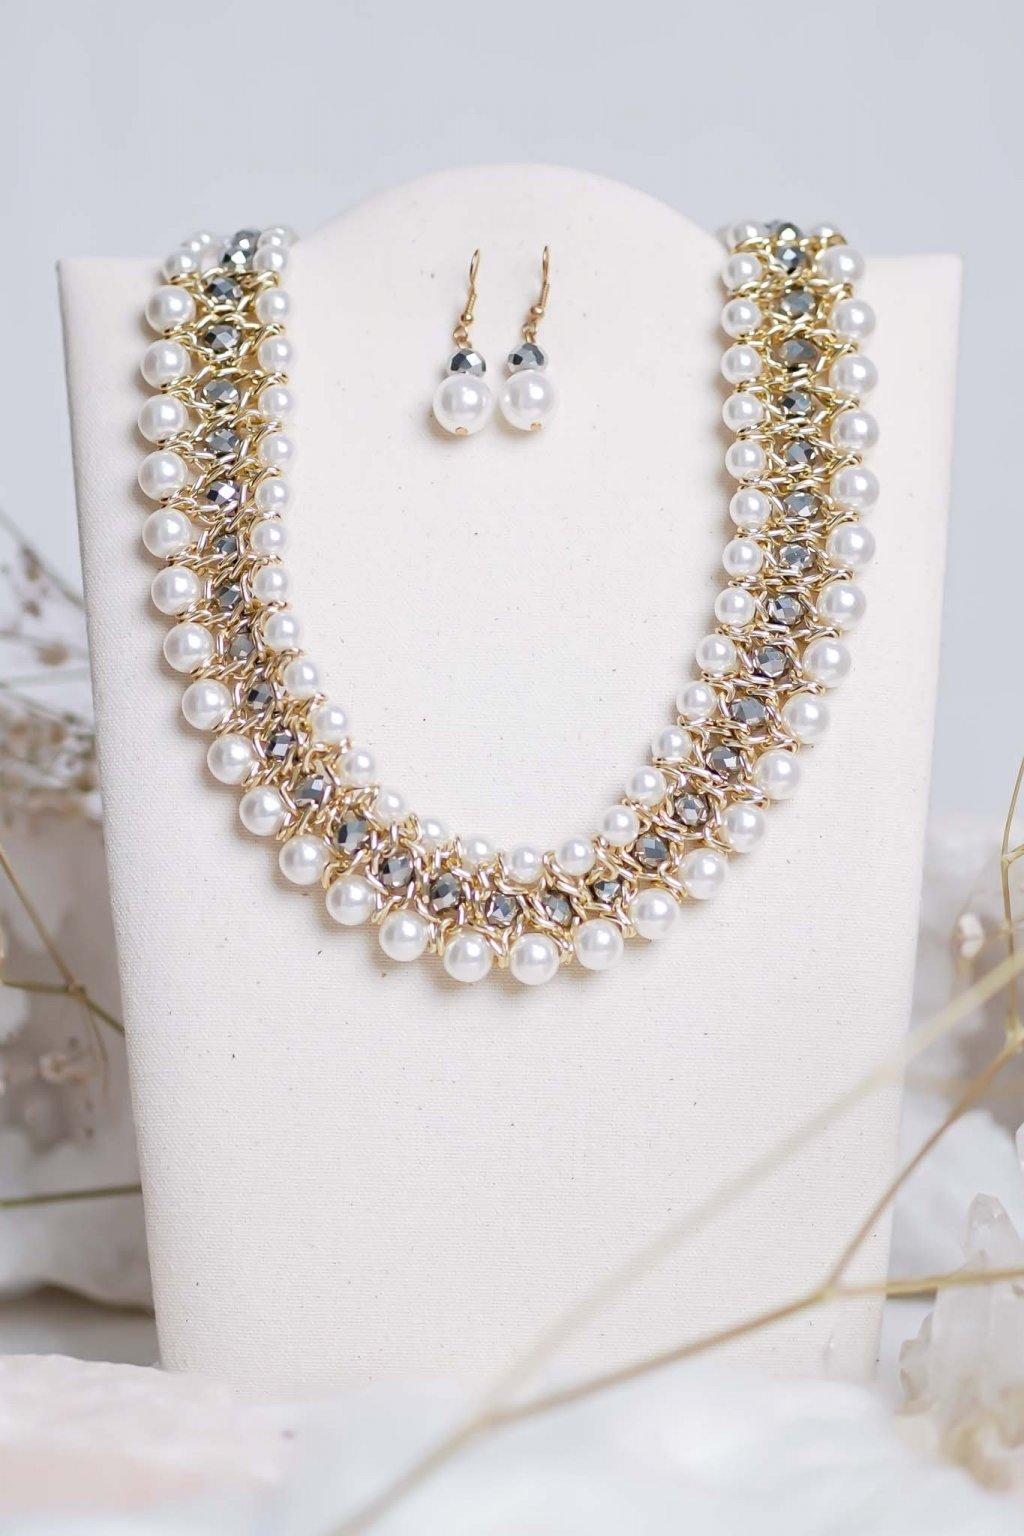 náhrdelník, šperk, spoločenská náhrdelník, náhrdelník na bežný deň, výrazný náhrdelník, jemný náhrdelník, šperky, náhrdelník na ples, svadbu, stužkovú 50